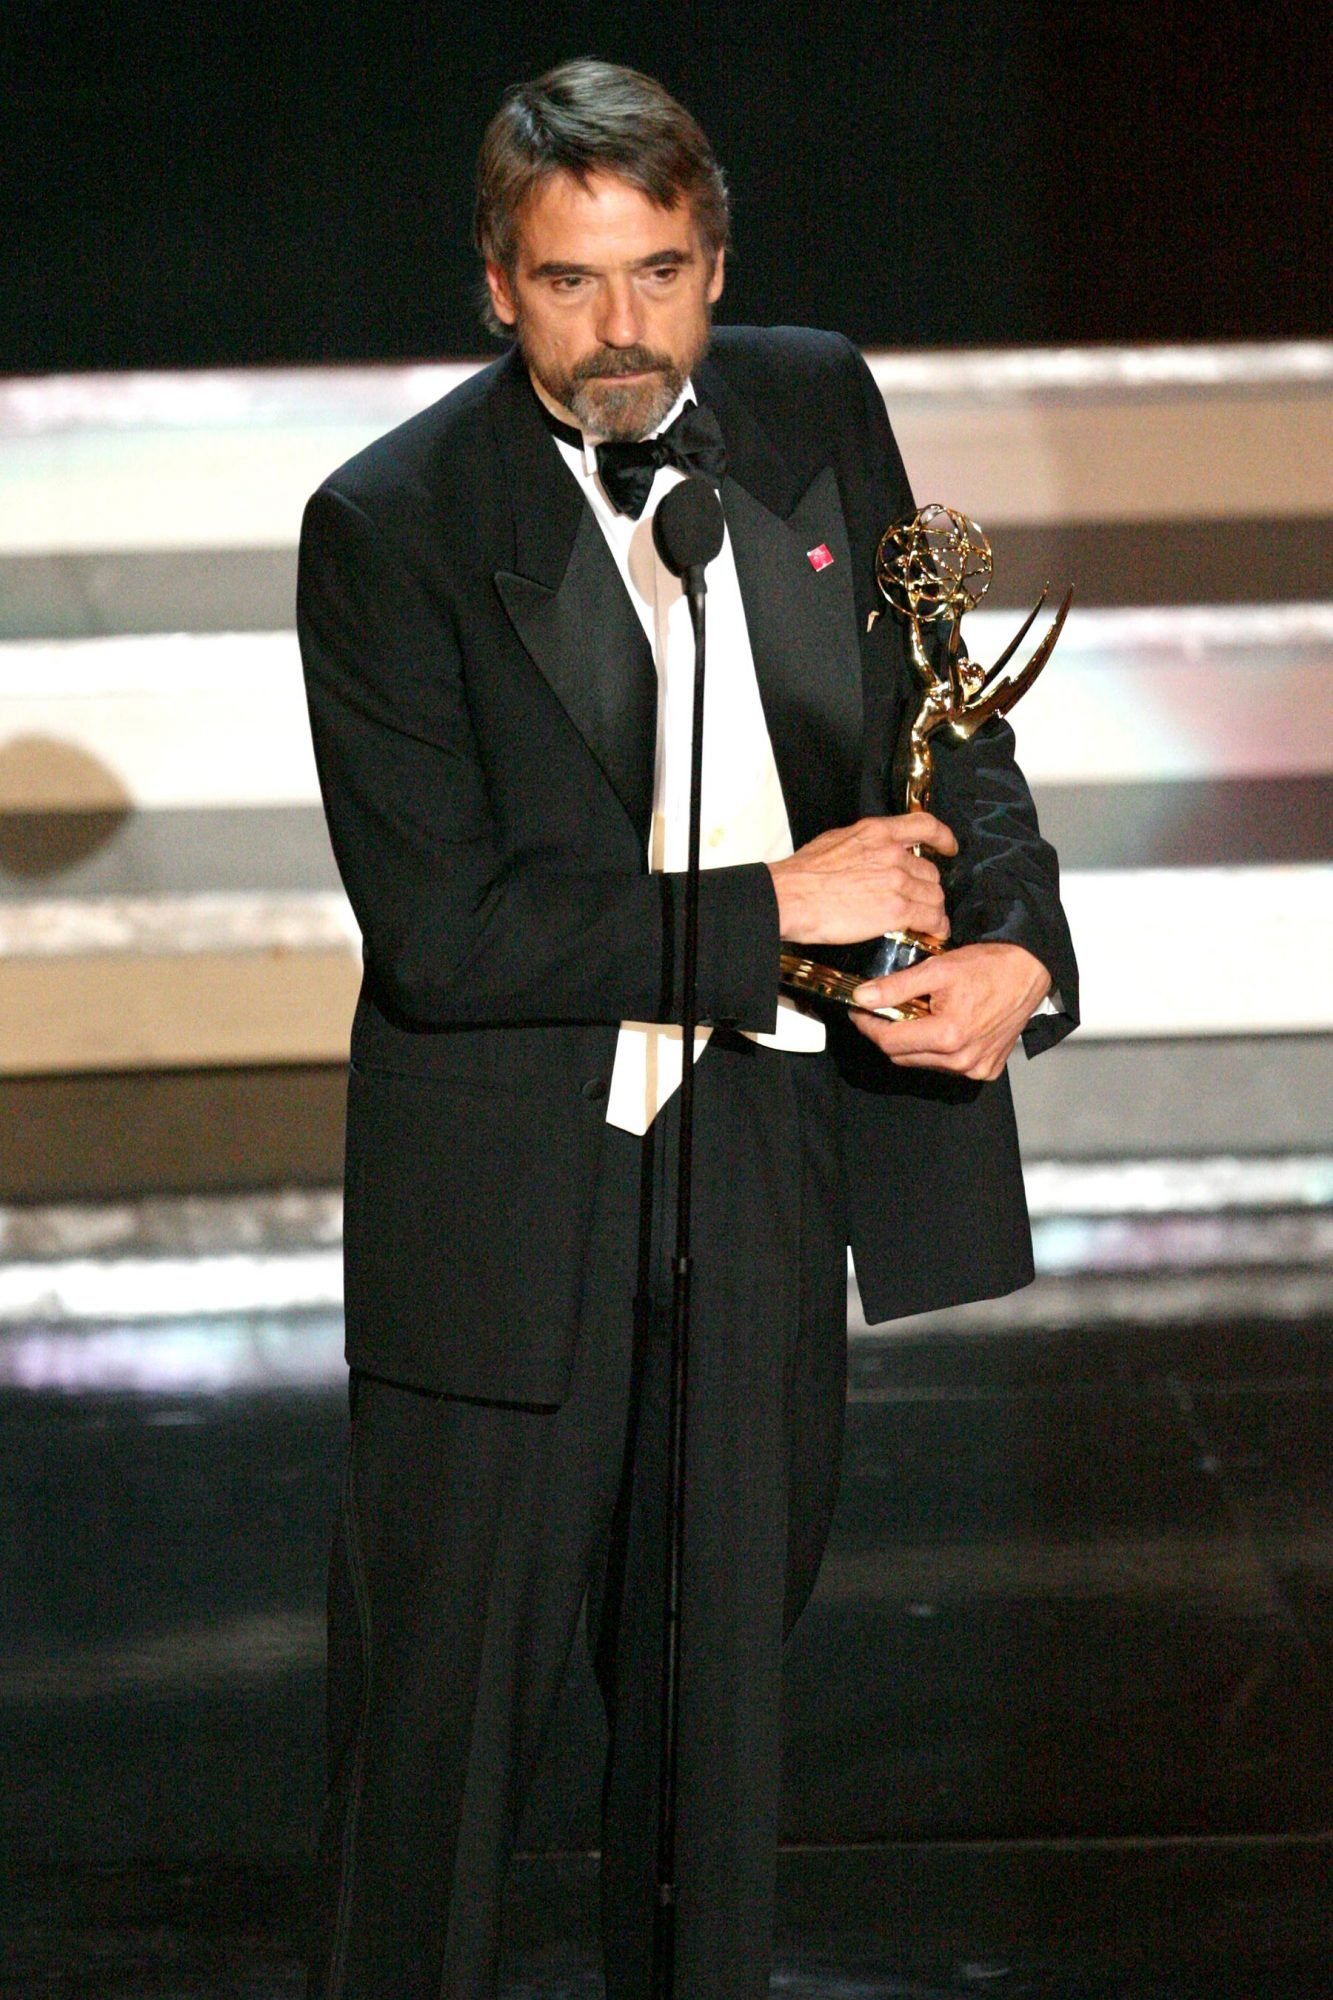 58th Annual Primetime Emmy Awards - Show - Balcony